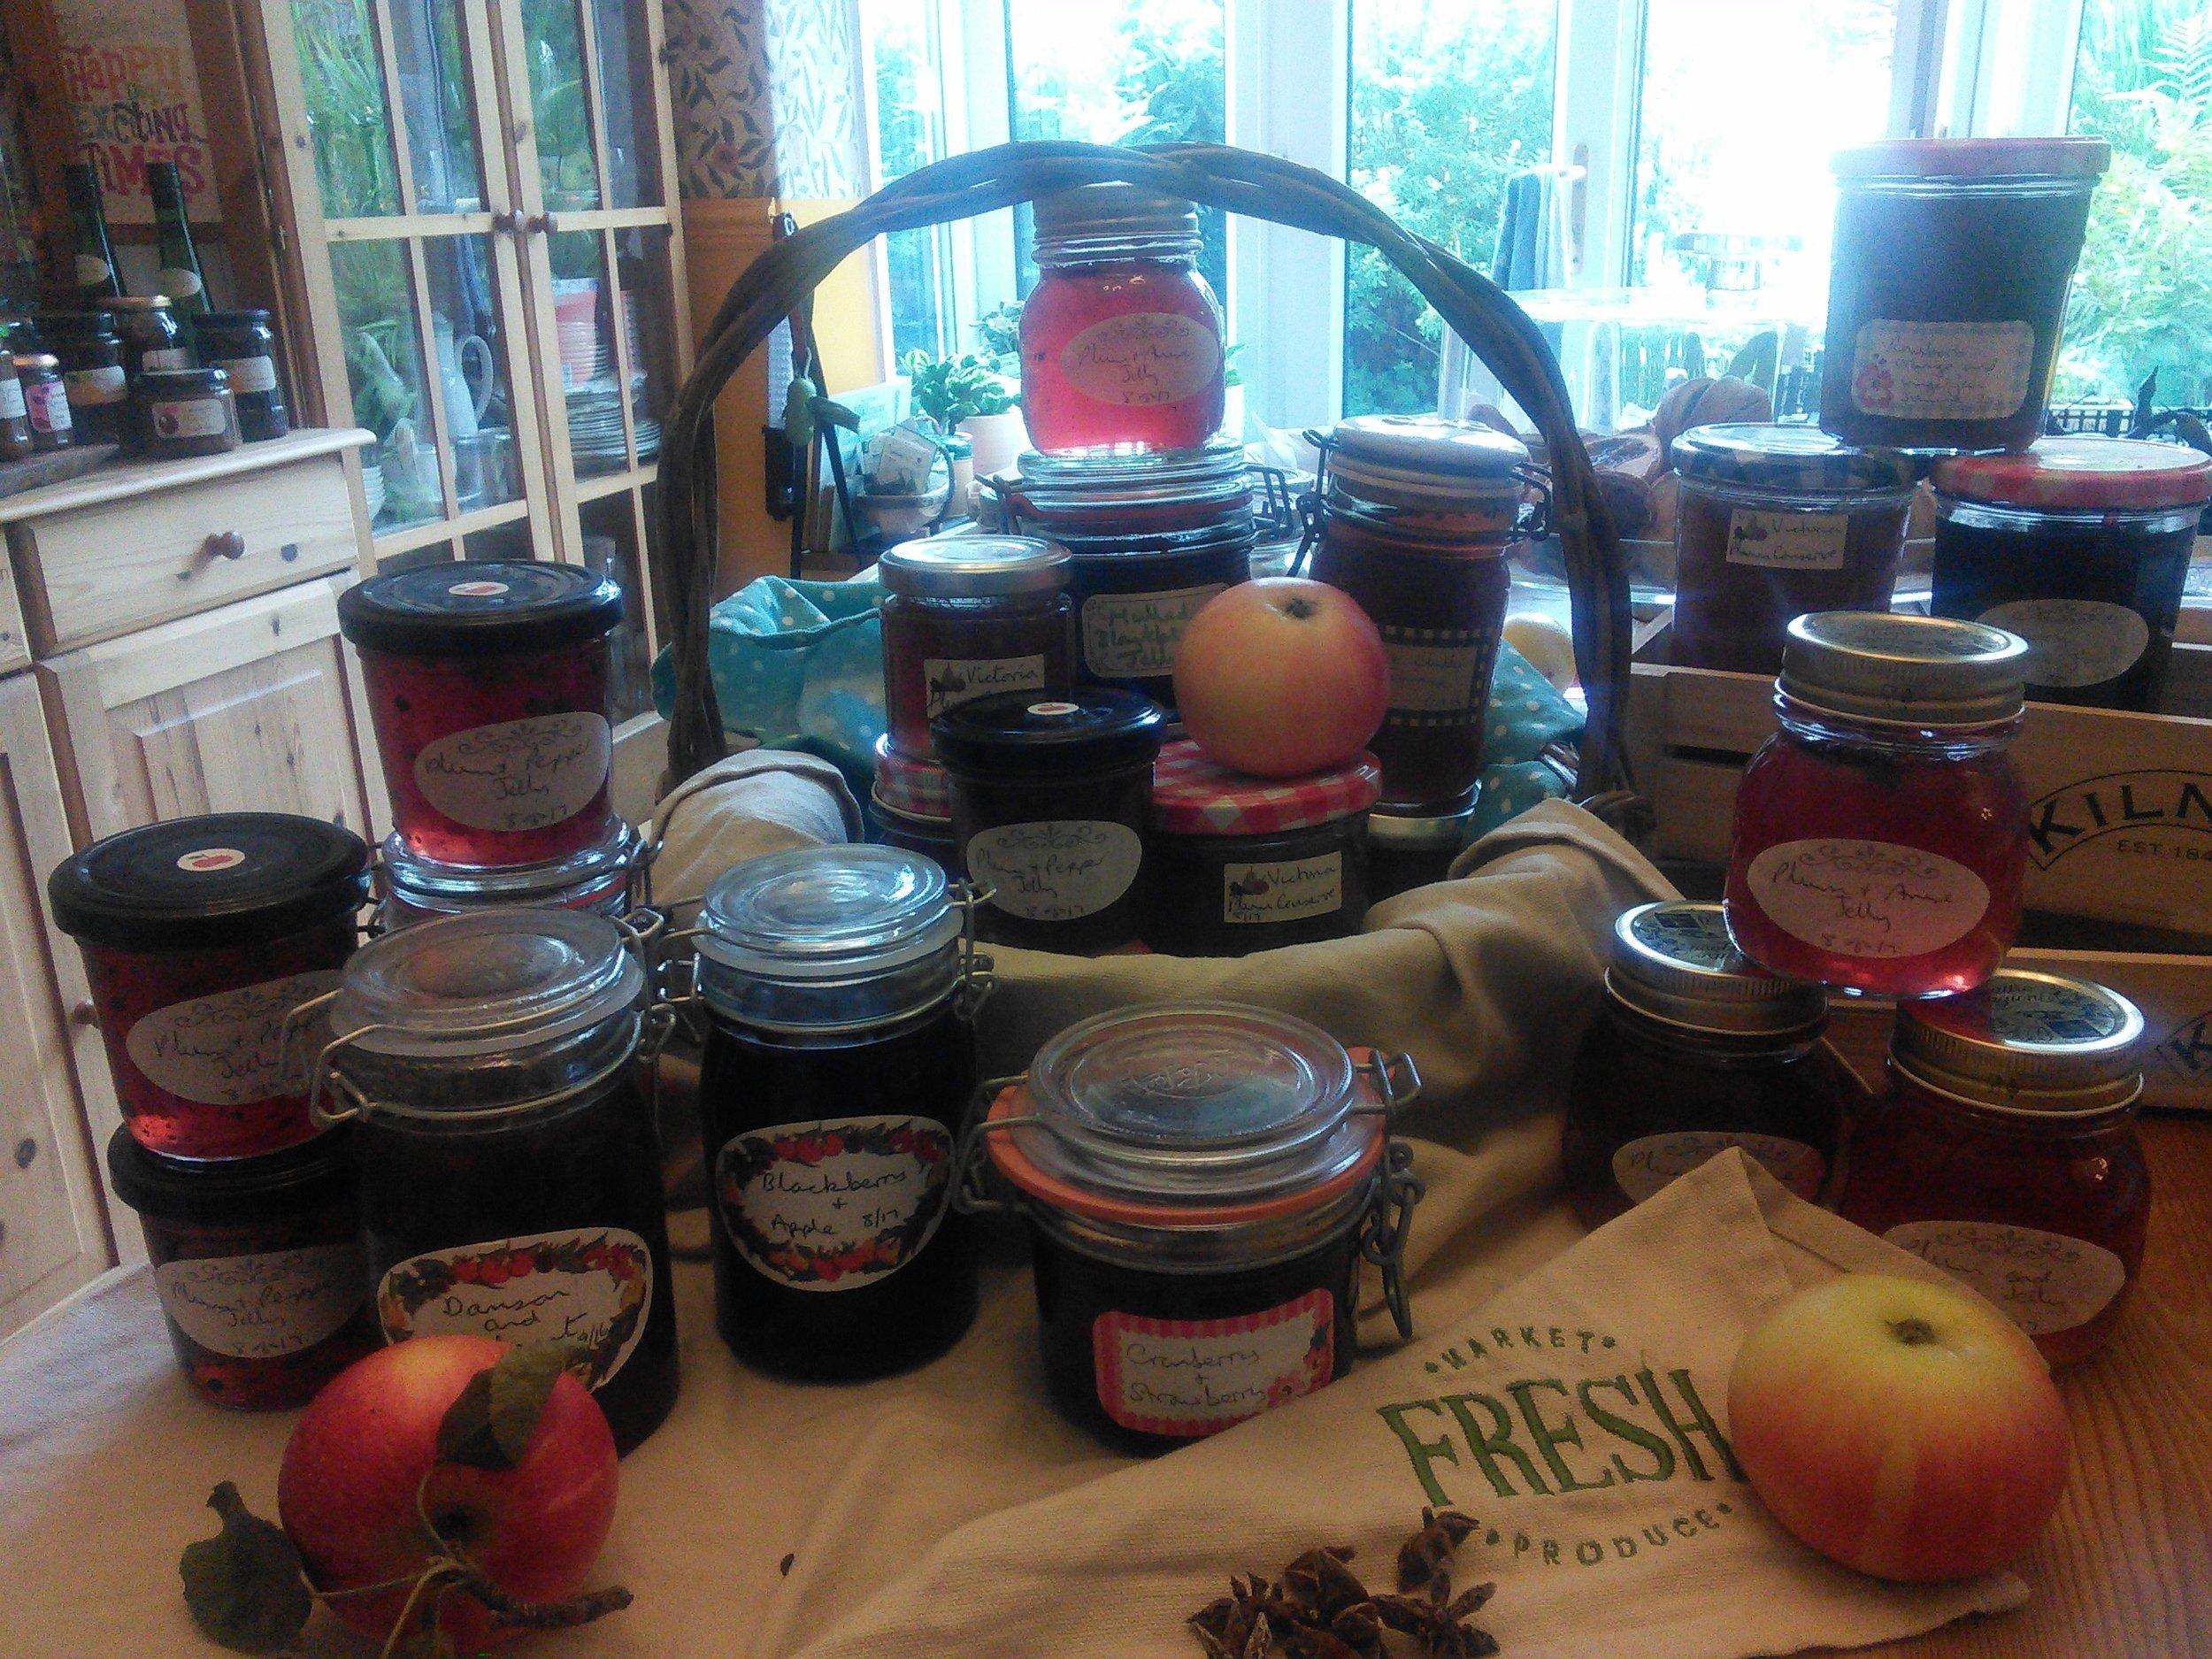 Jams, jellies and marmalades